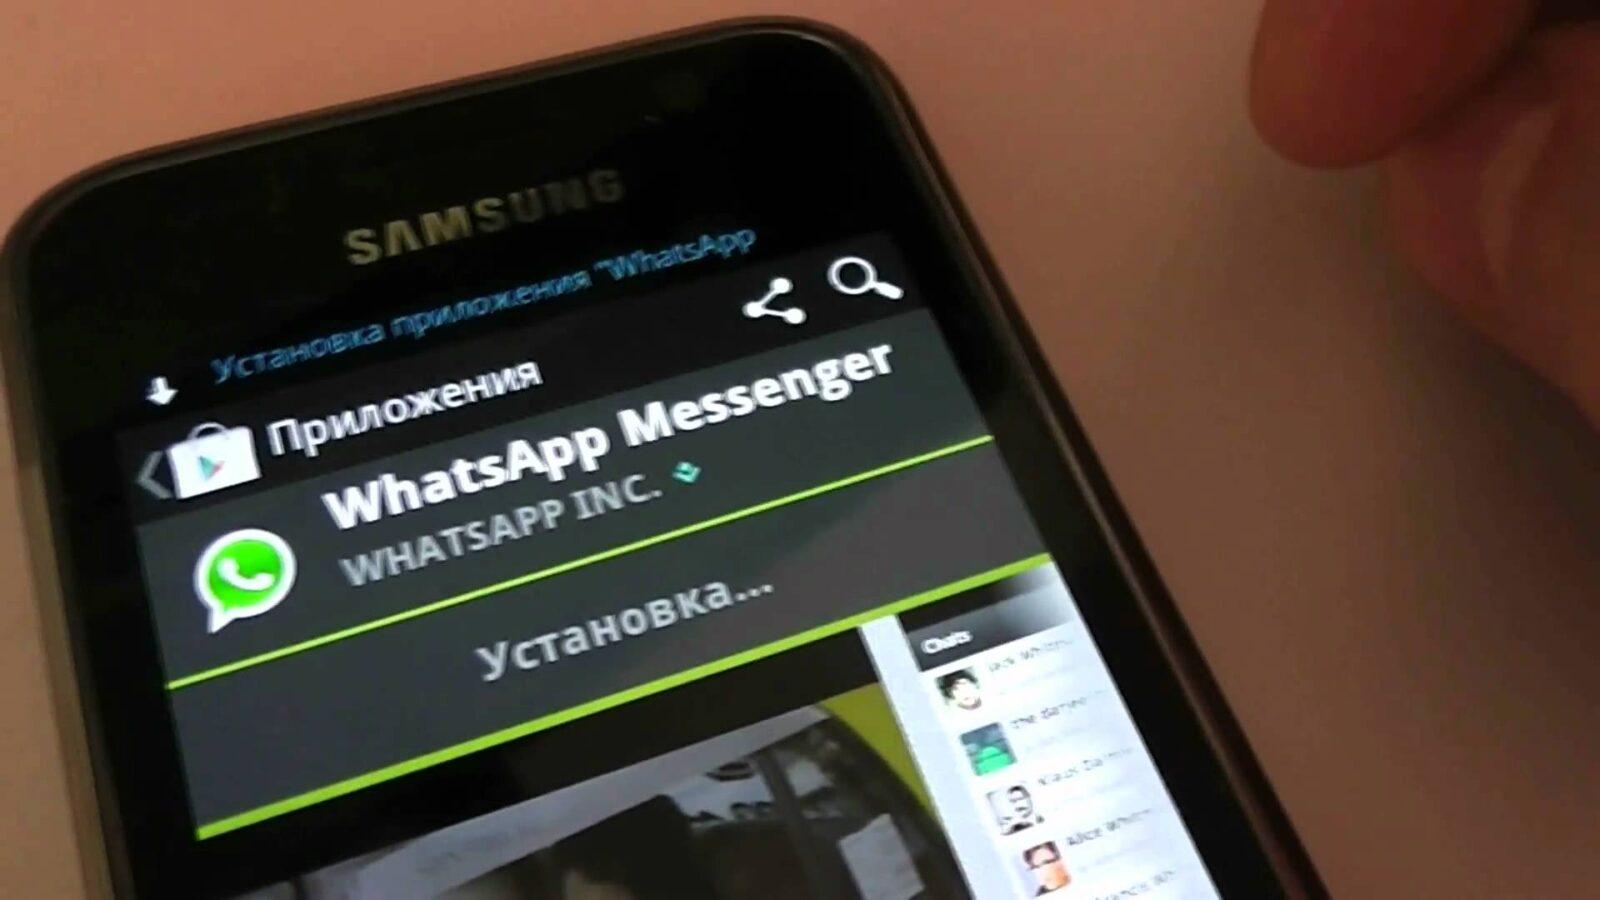 samsung gt-s5230 whatsapp